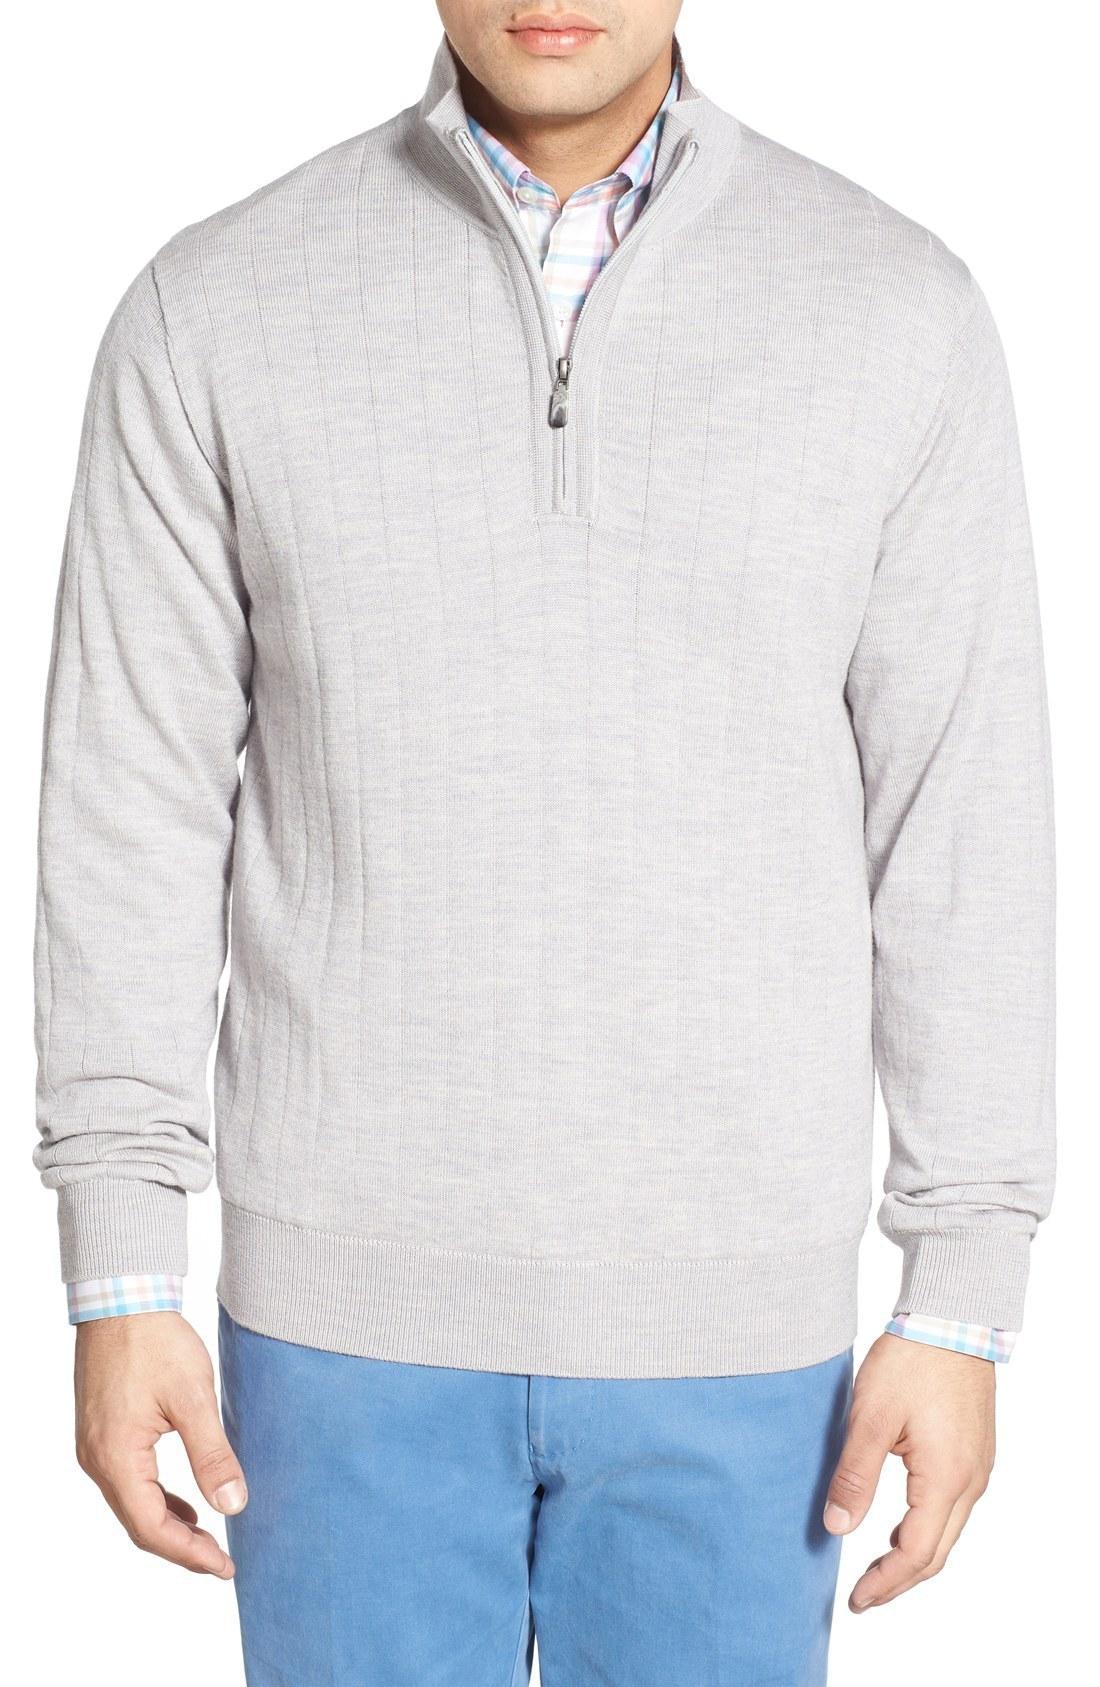 e5e83fe0dd32c4 Bobby Jones Windproof Merino Wool Quarter Zip Sweater In Heather ...